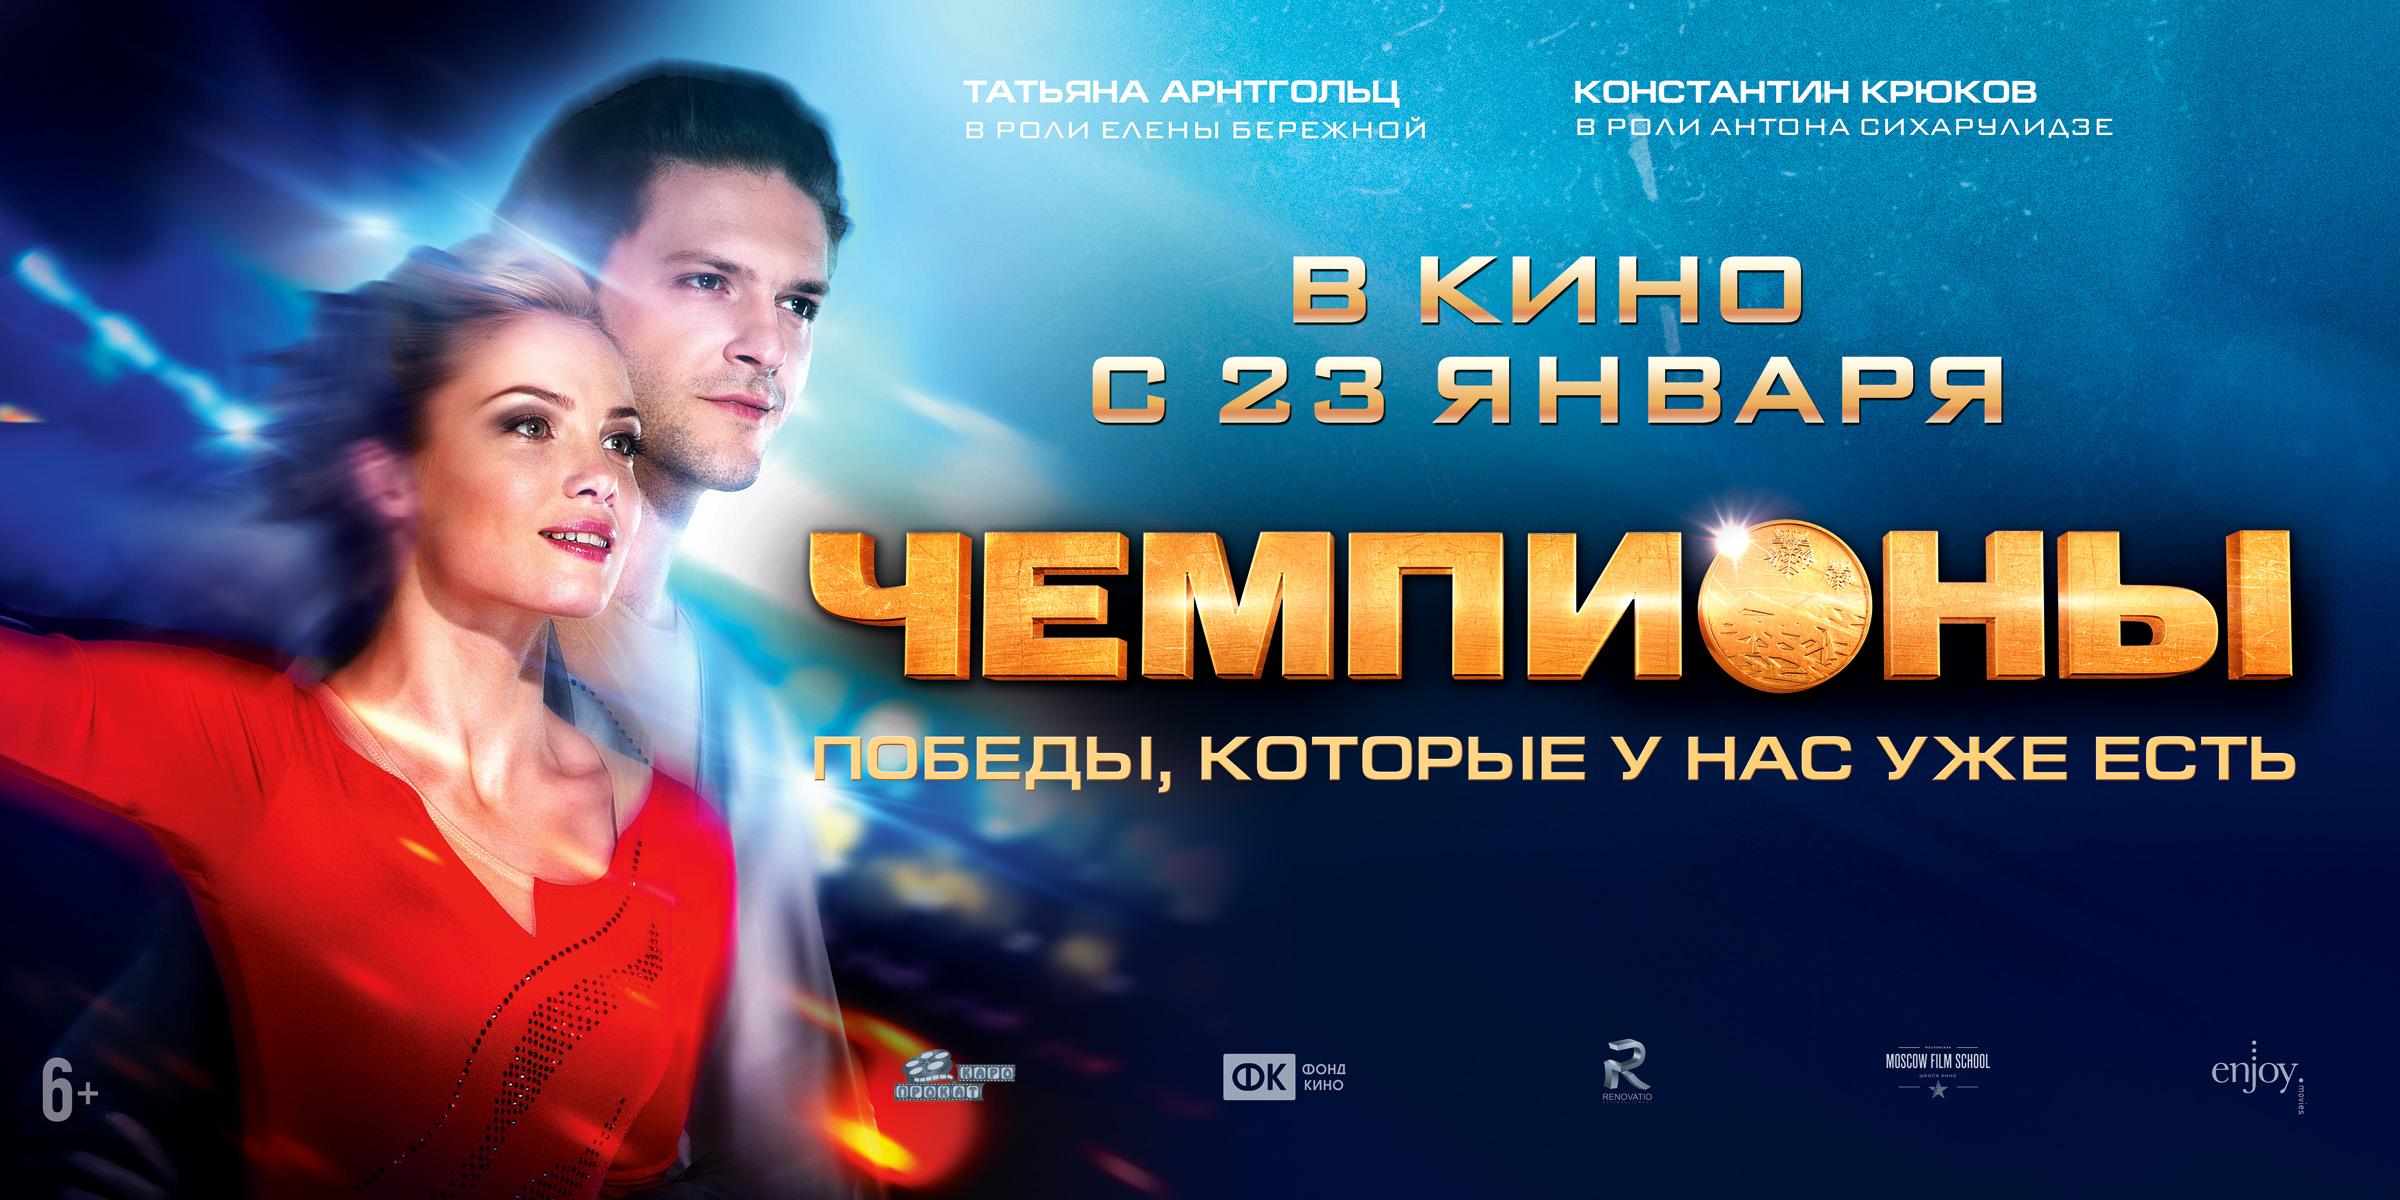 плакат фильма характер-постер баннер Чемпионы